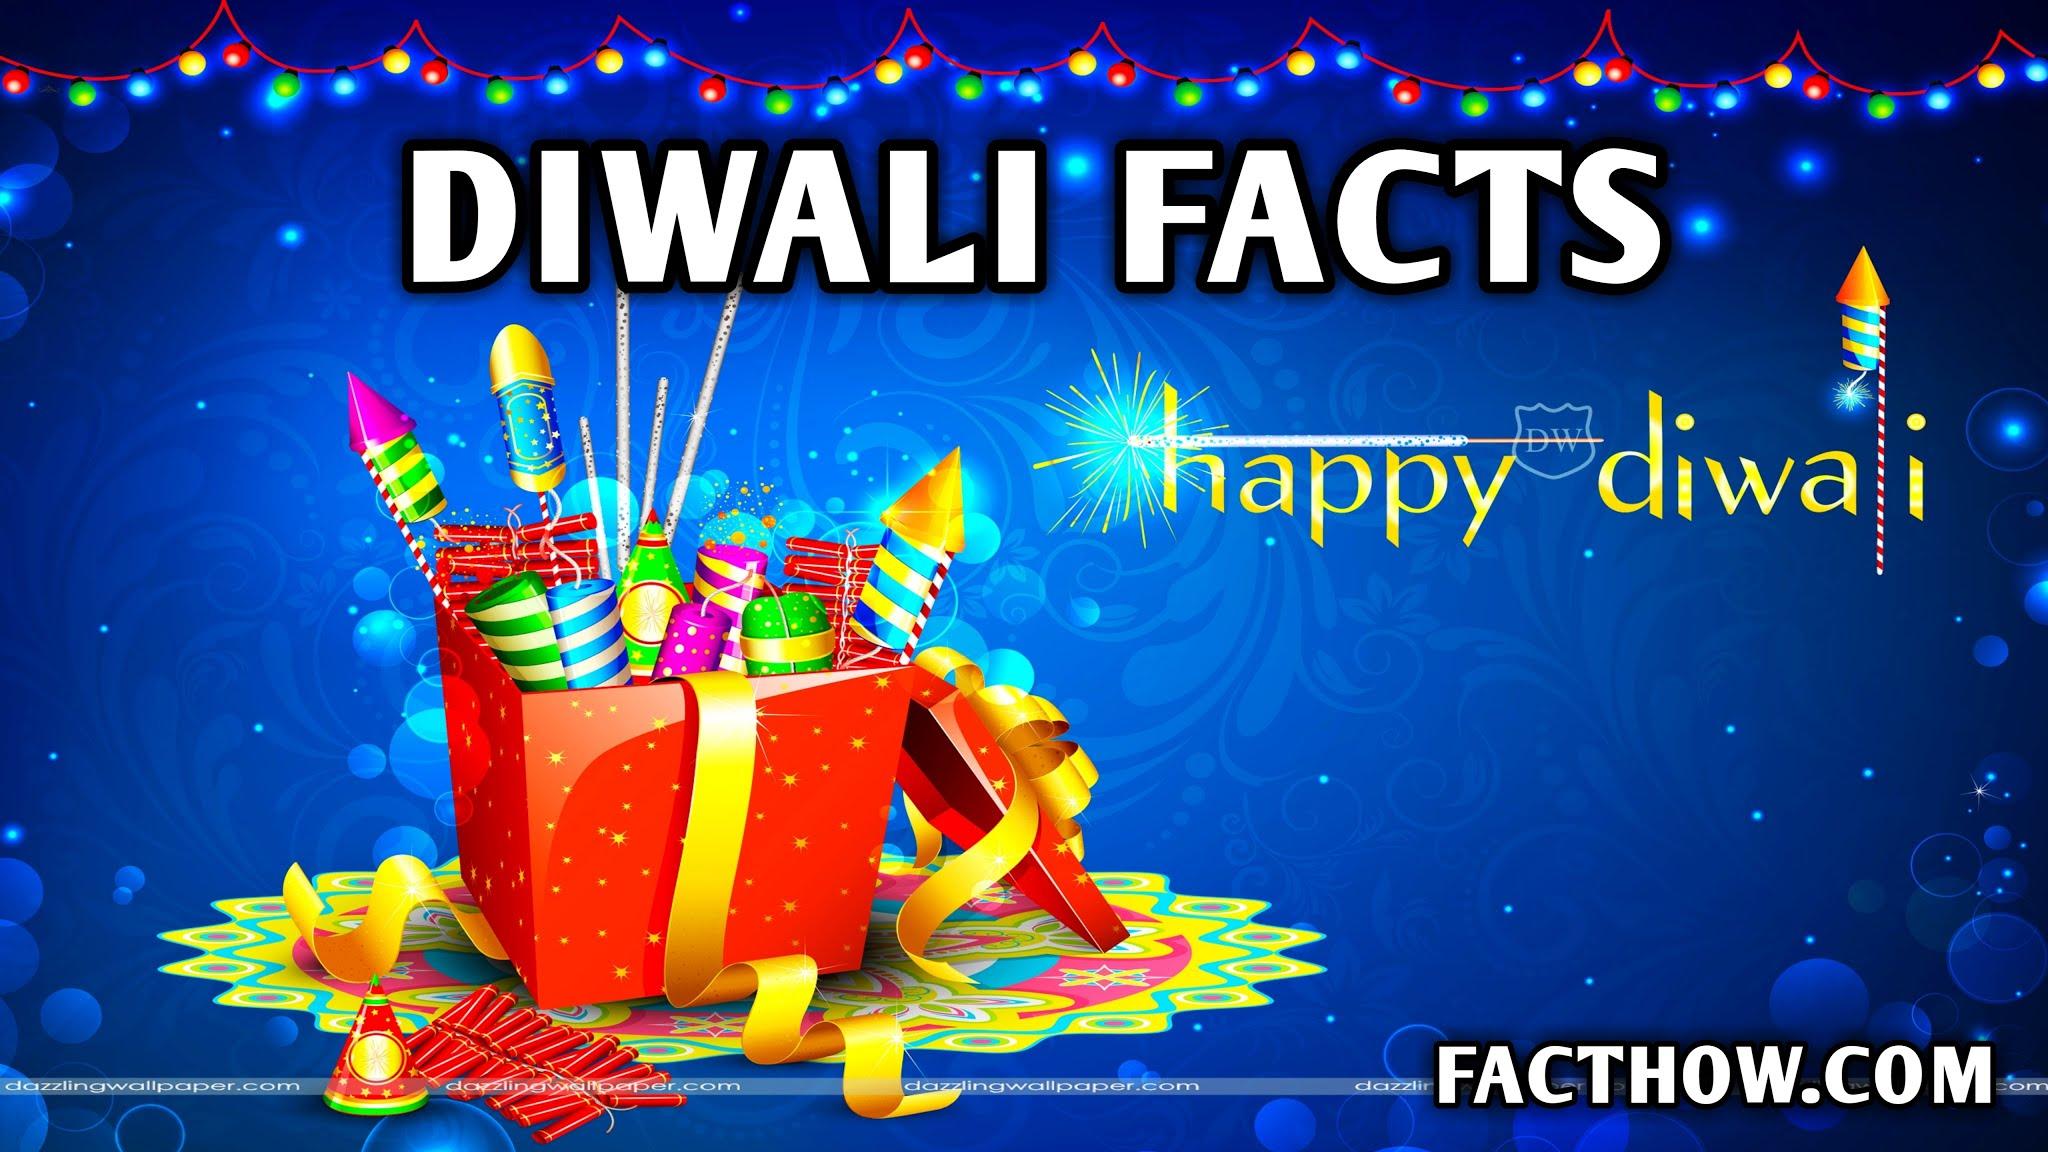 Facts-diwali-interesting-amazing-diwali-deepawali-facts-hindi-diwali-rochak-tathya-jaankari-amazon-great-indian-sale-diwali-offer-flipcart-big-billion-days-diwali-offer-what-is-diwali-facthow-fact-how